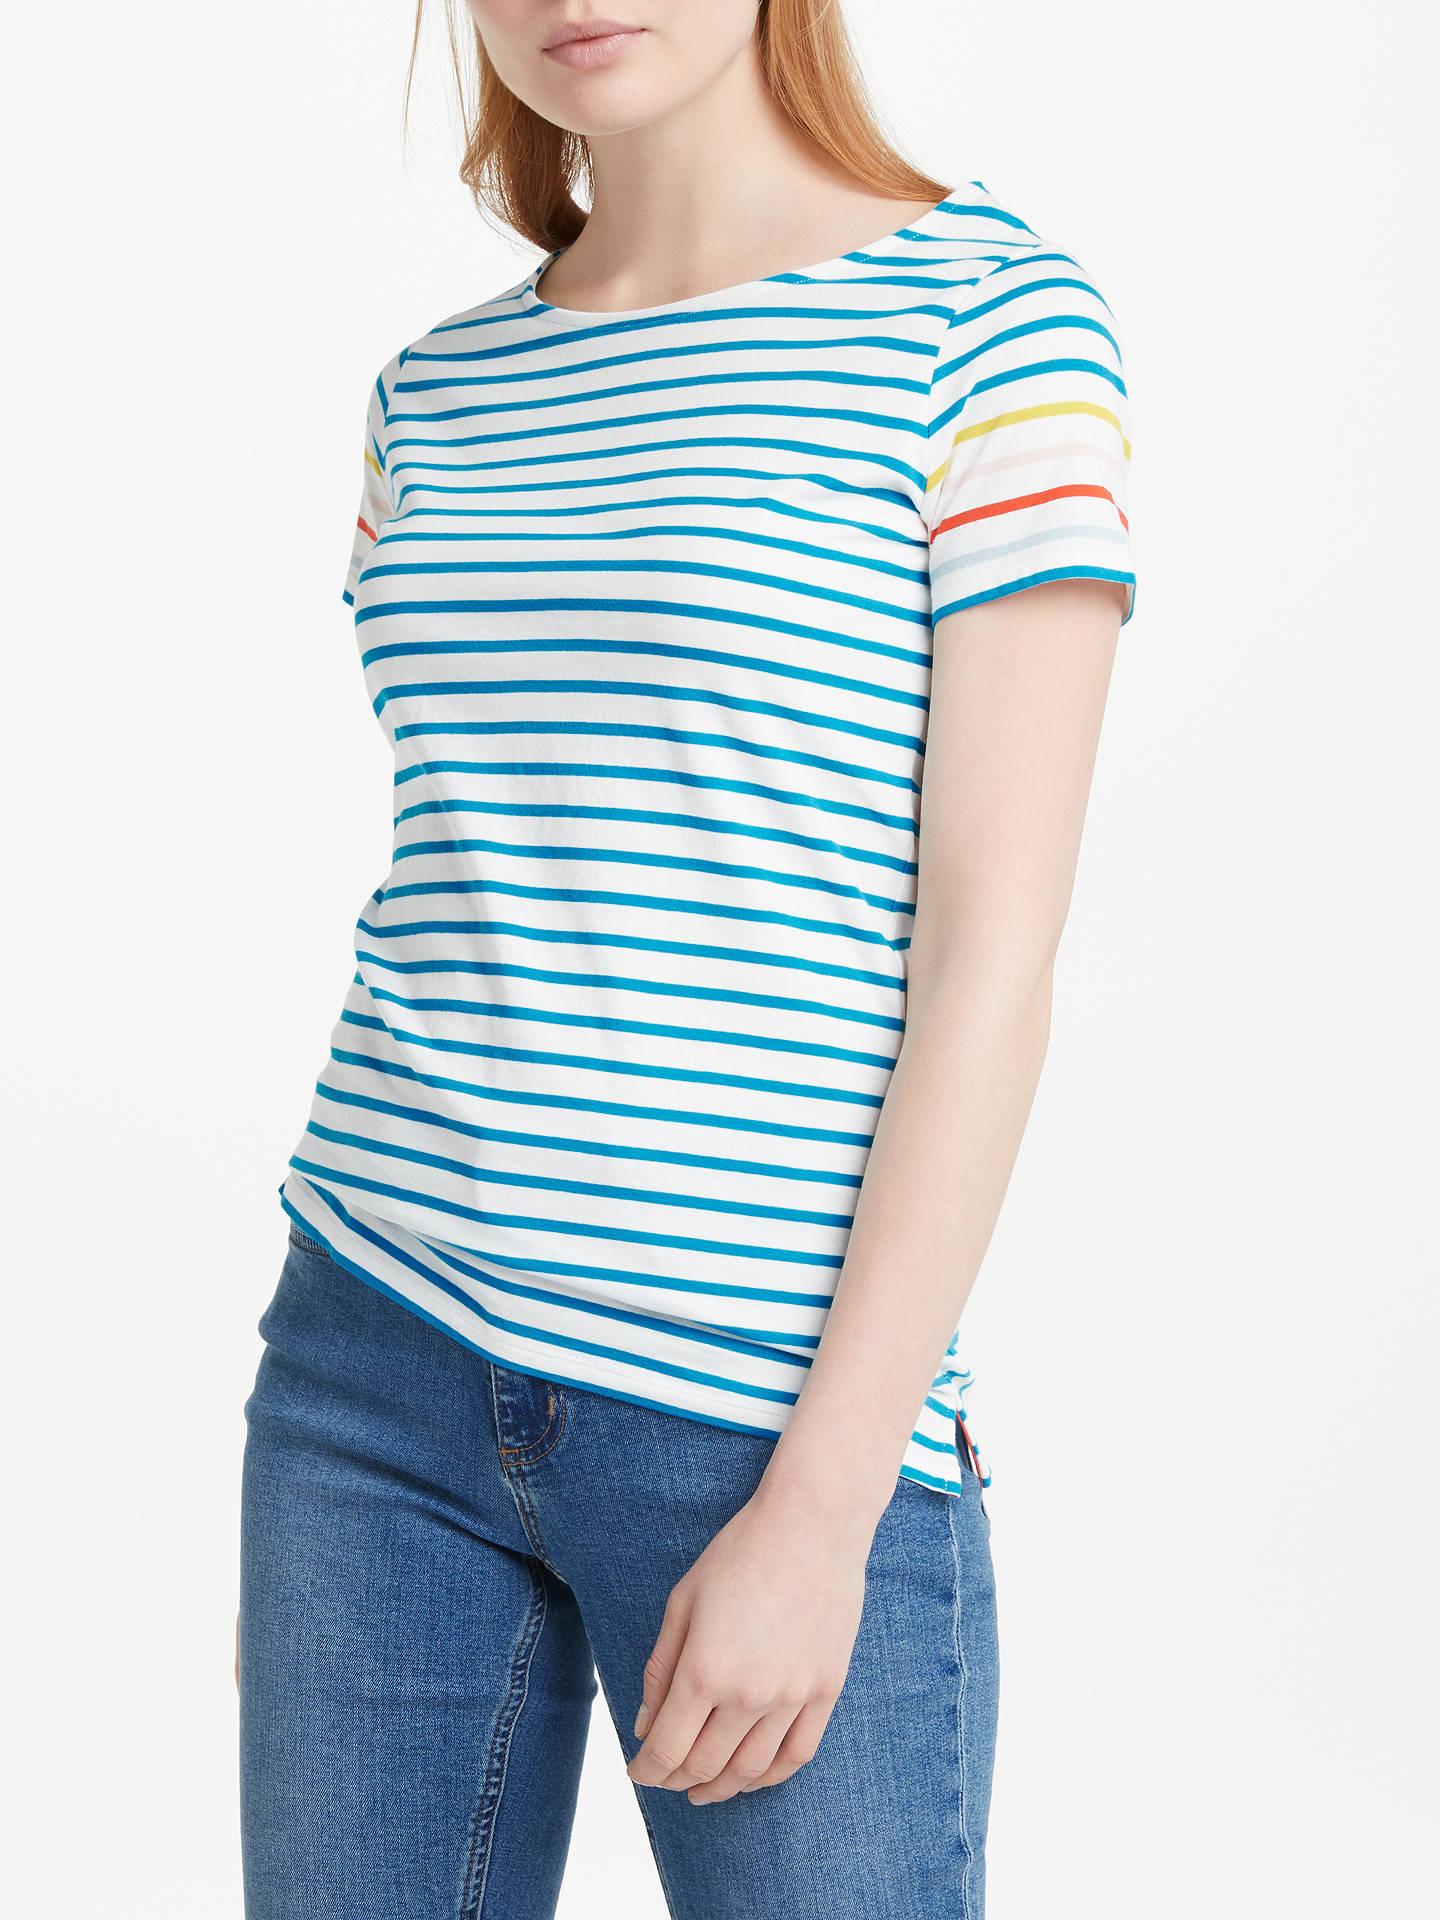 Ex Mini Boden Hotchpotch Dresses Tunics  2 3 4 5 6 7 8 9 10 11 12 Yrs NEW!